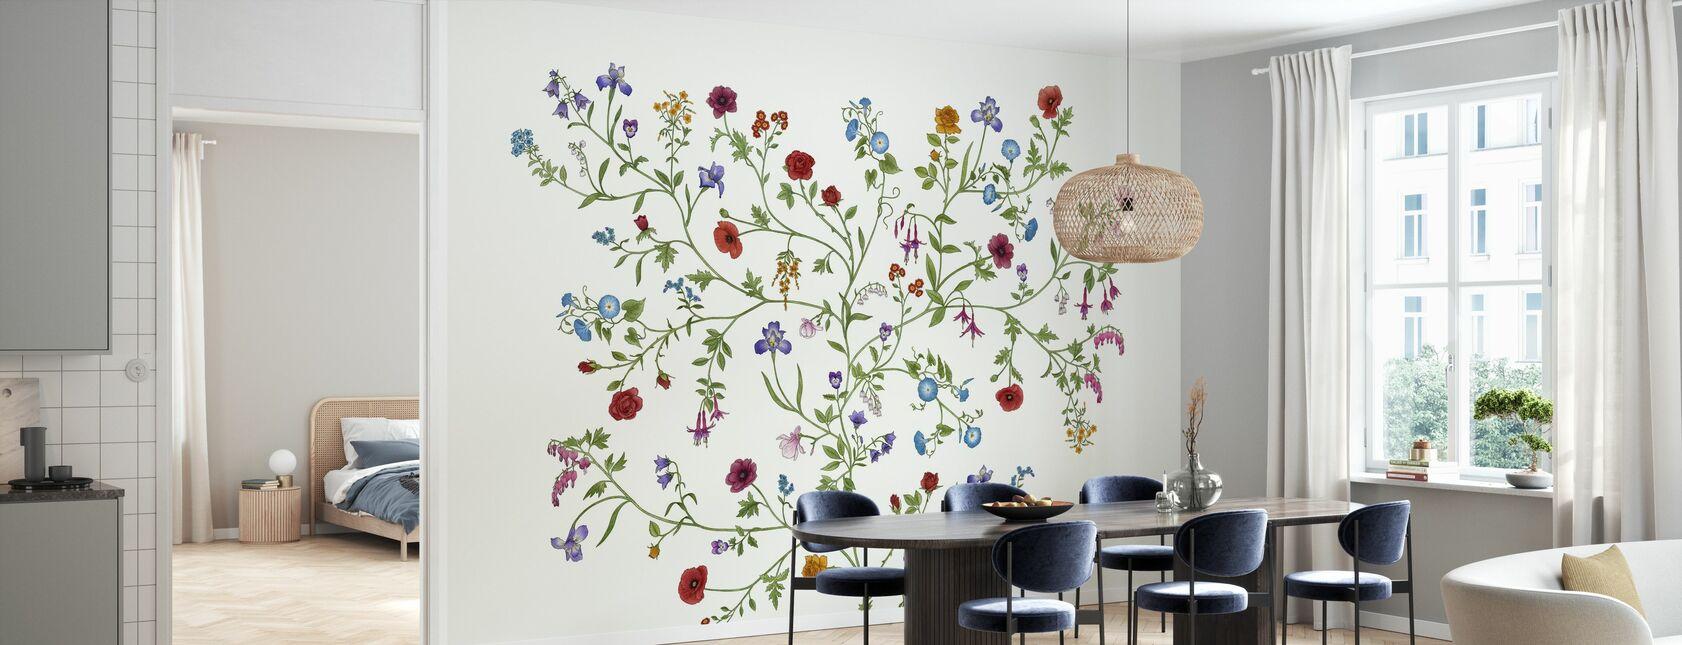 Flora - White - Wallpaper - Kitchen